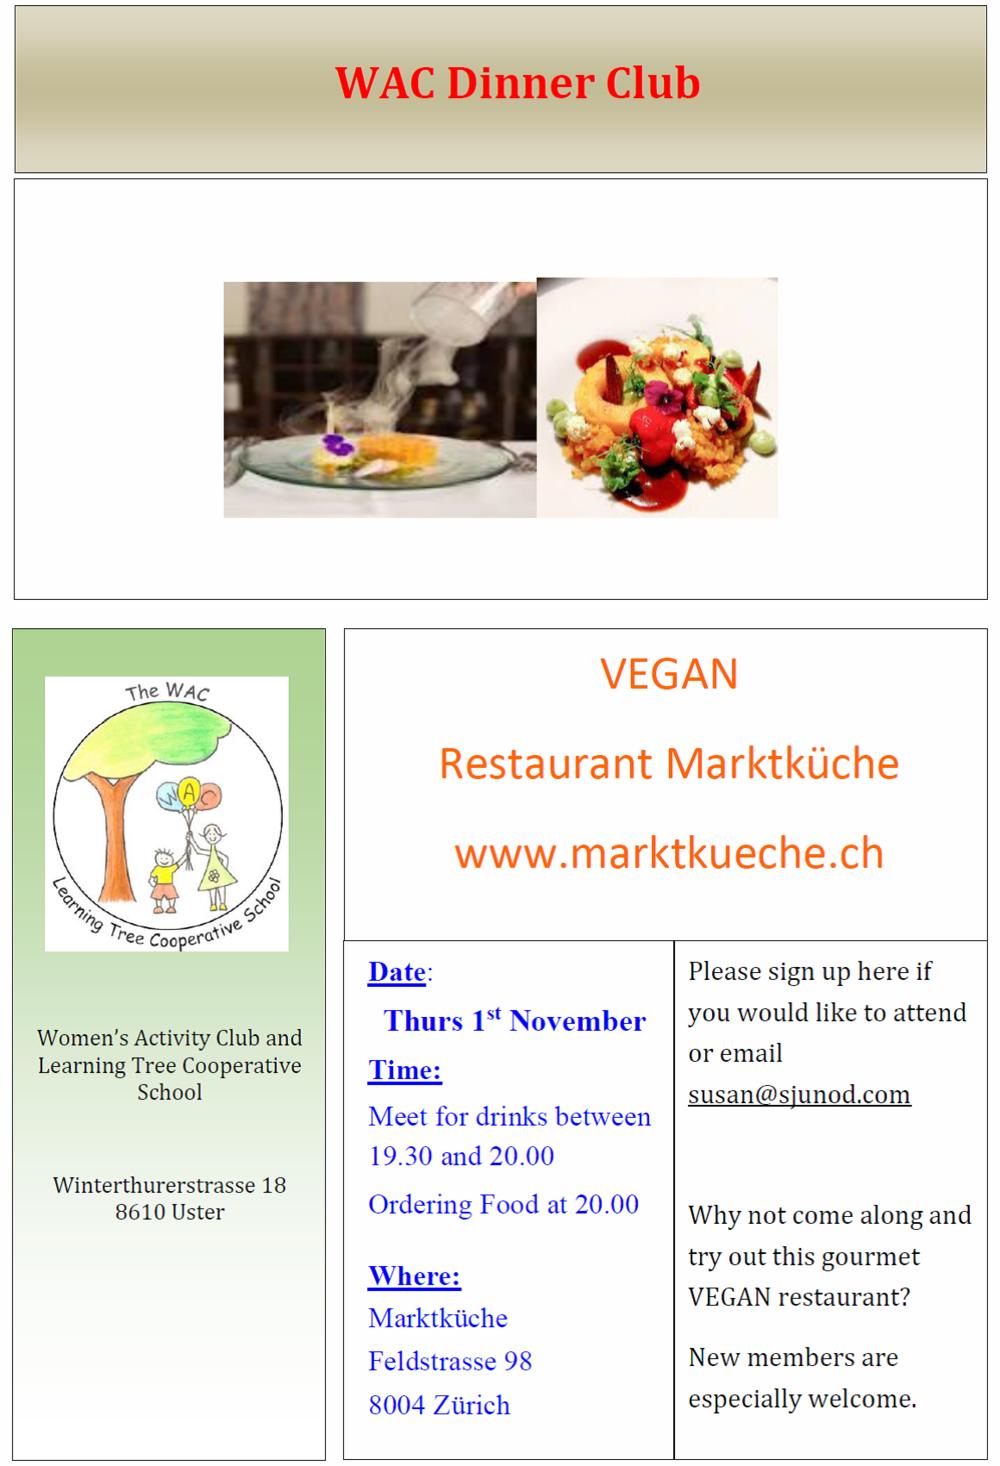 Dinner Club Vegan November 2018.png